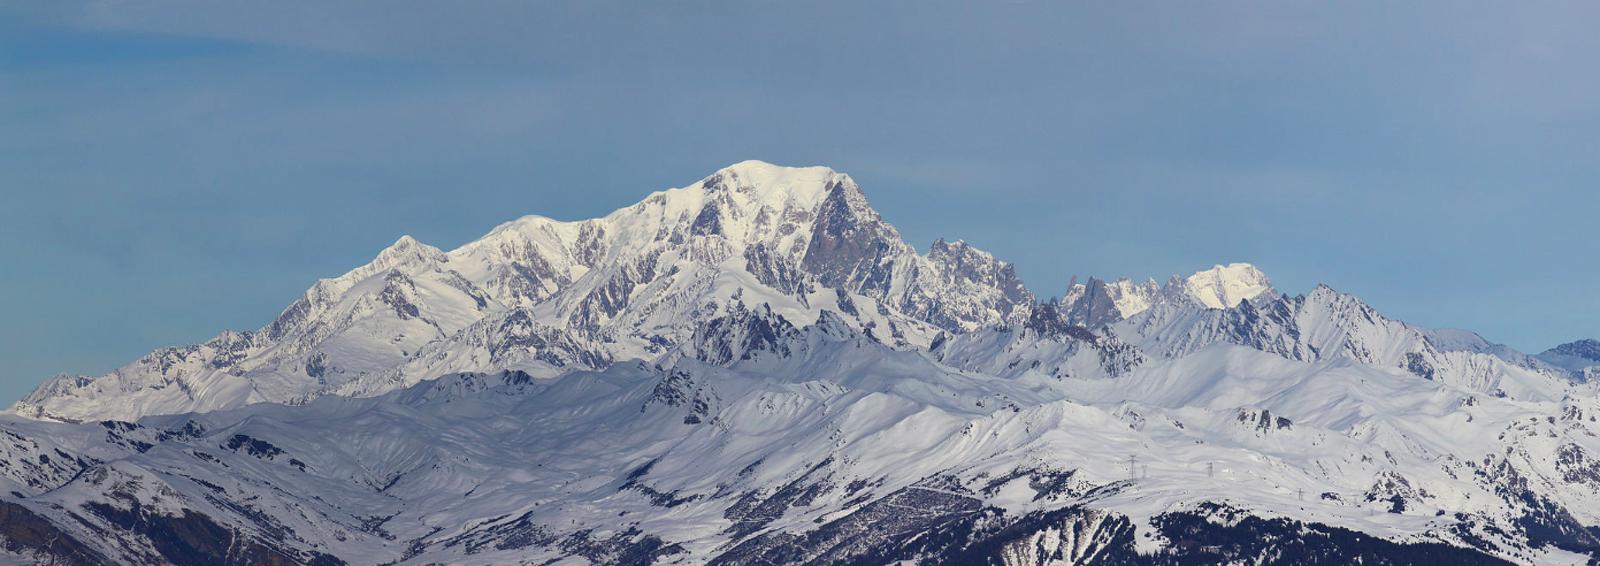 La cara sud del Mont Blanc